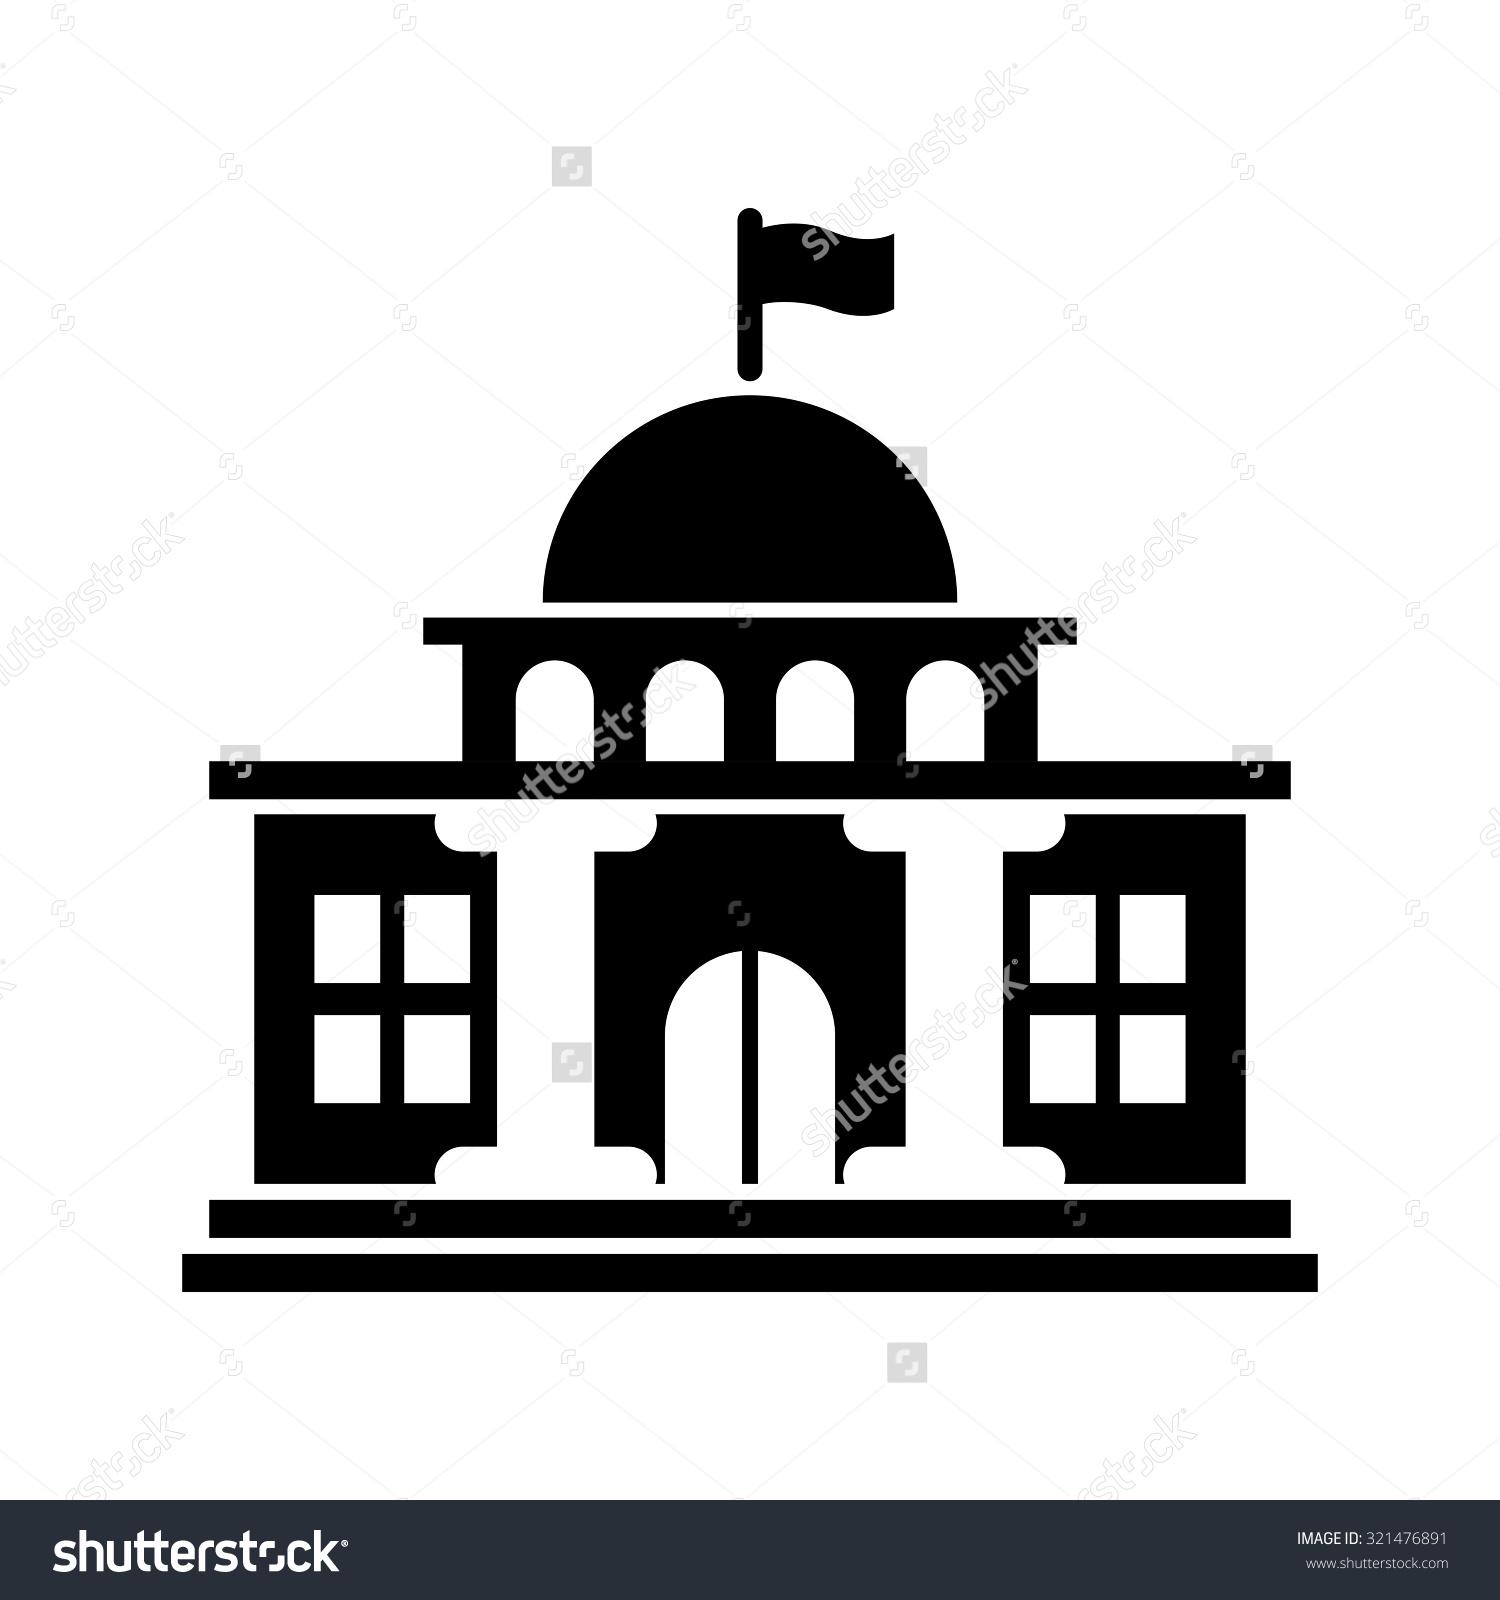 Clip art government symbols.